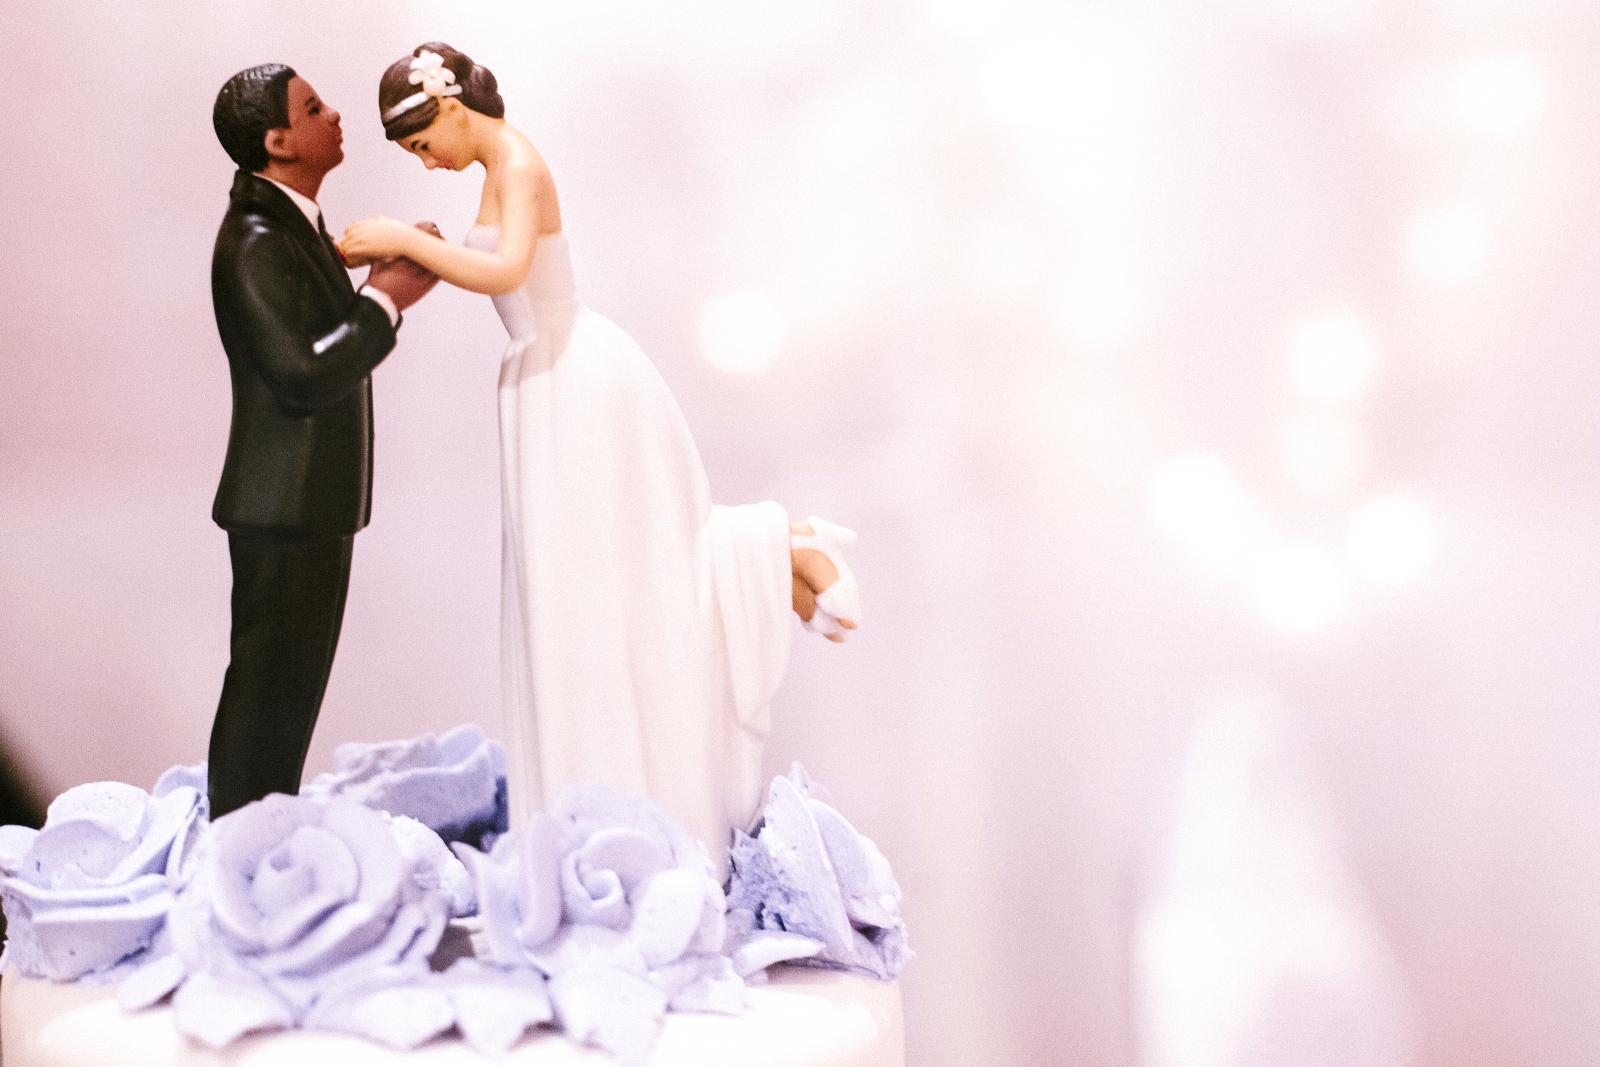 Bride and bridegroom cake decoration on top of wedding cake